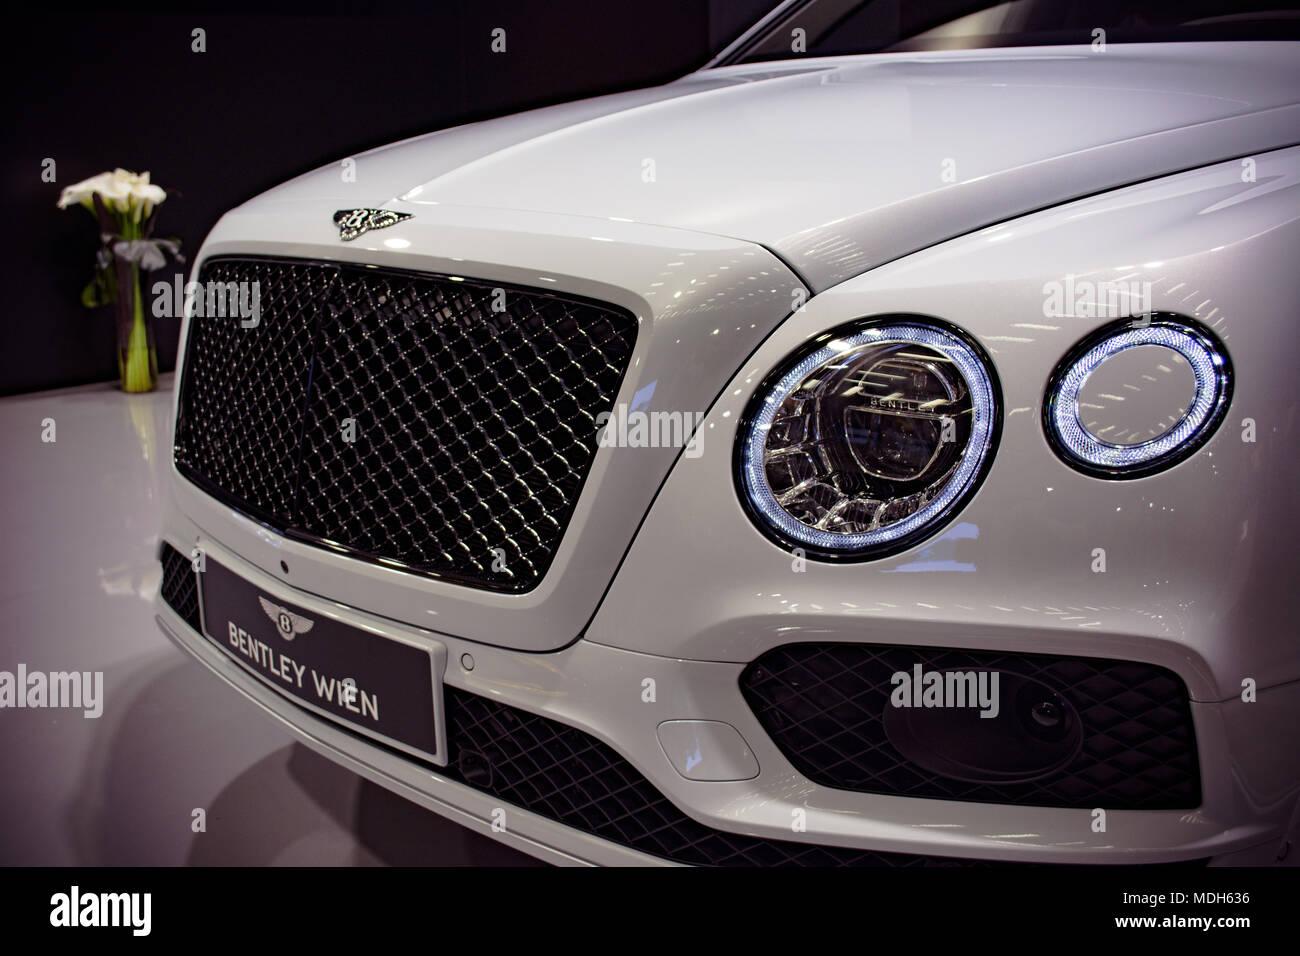 Bentley in Zagreb Auto Show, April 2018 - Stock Image